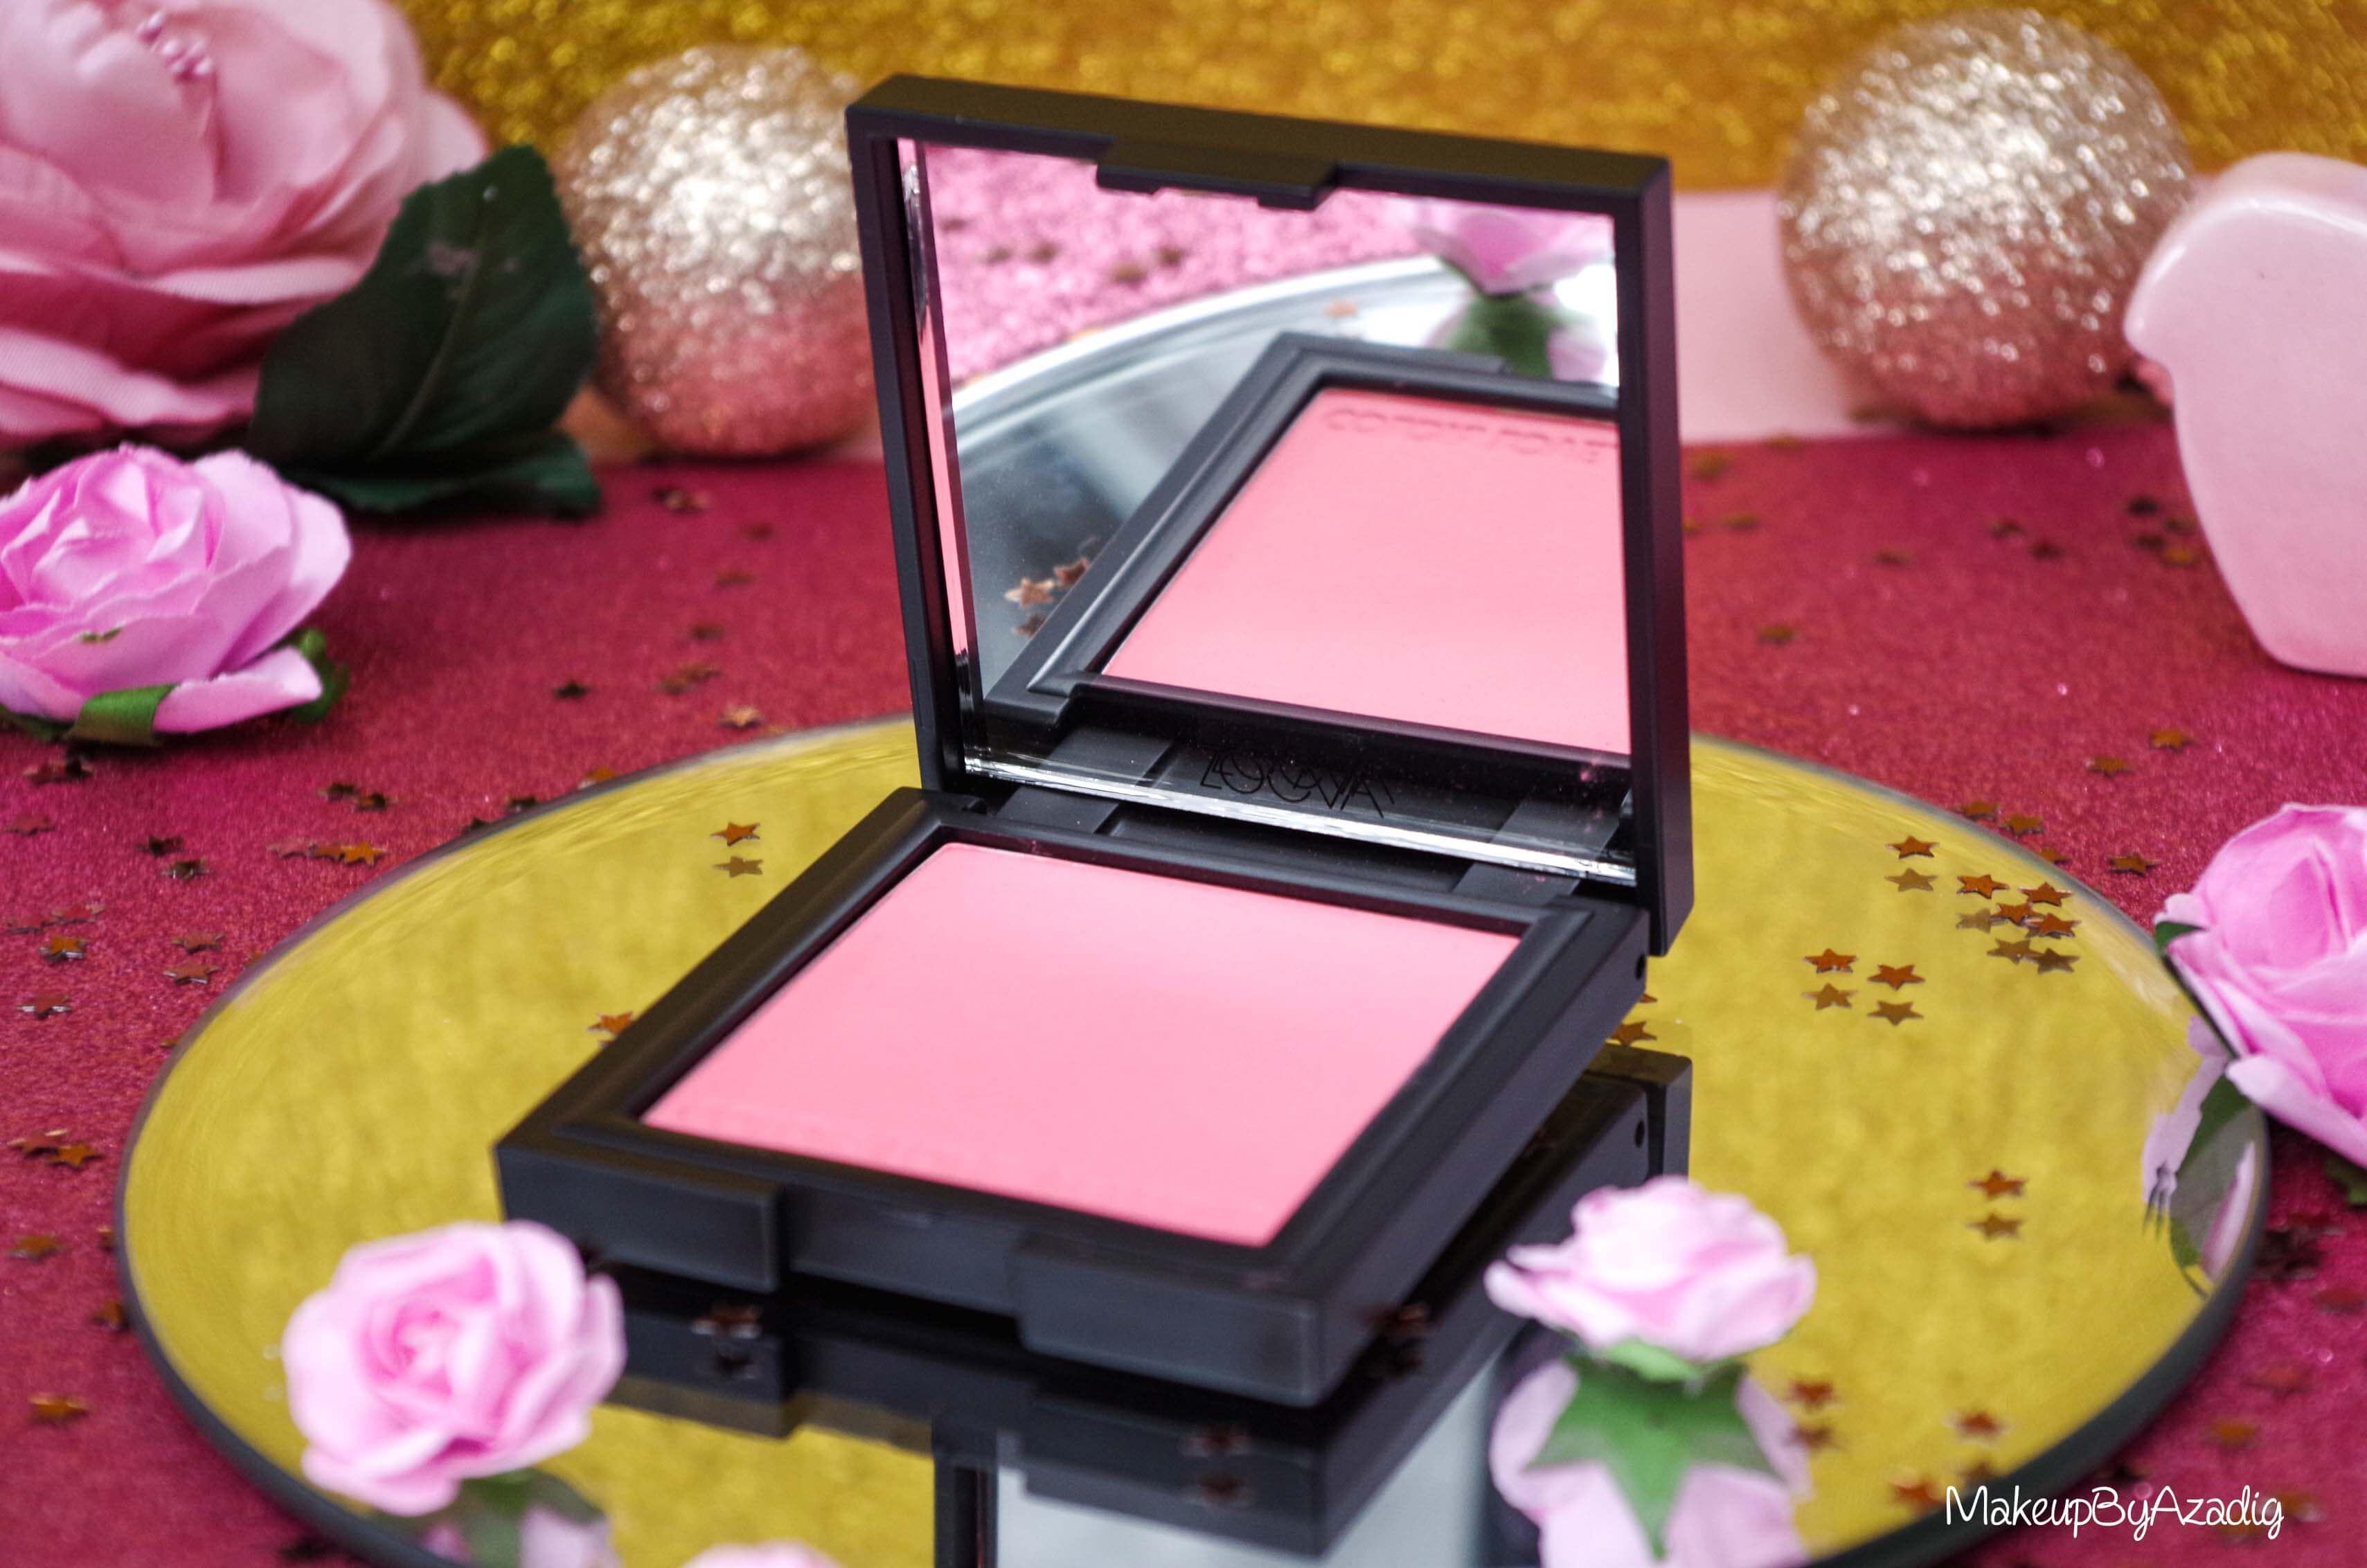 revue-review-luxe-color-blush-zoeva-sephora-france-helovesmemaybe-rush-rush-avis-swatch-makeupbyazadig-paris-pink